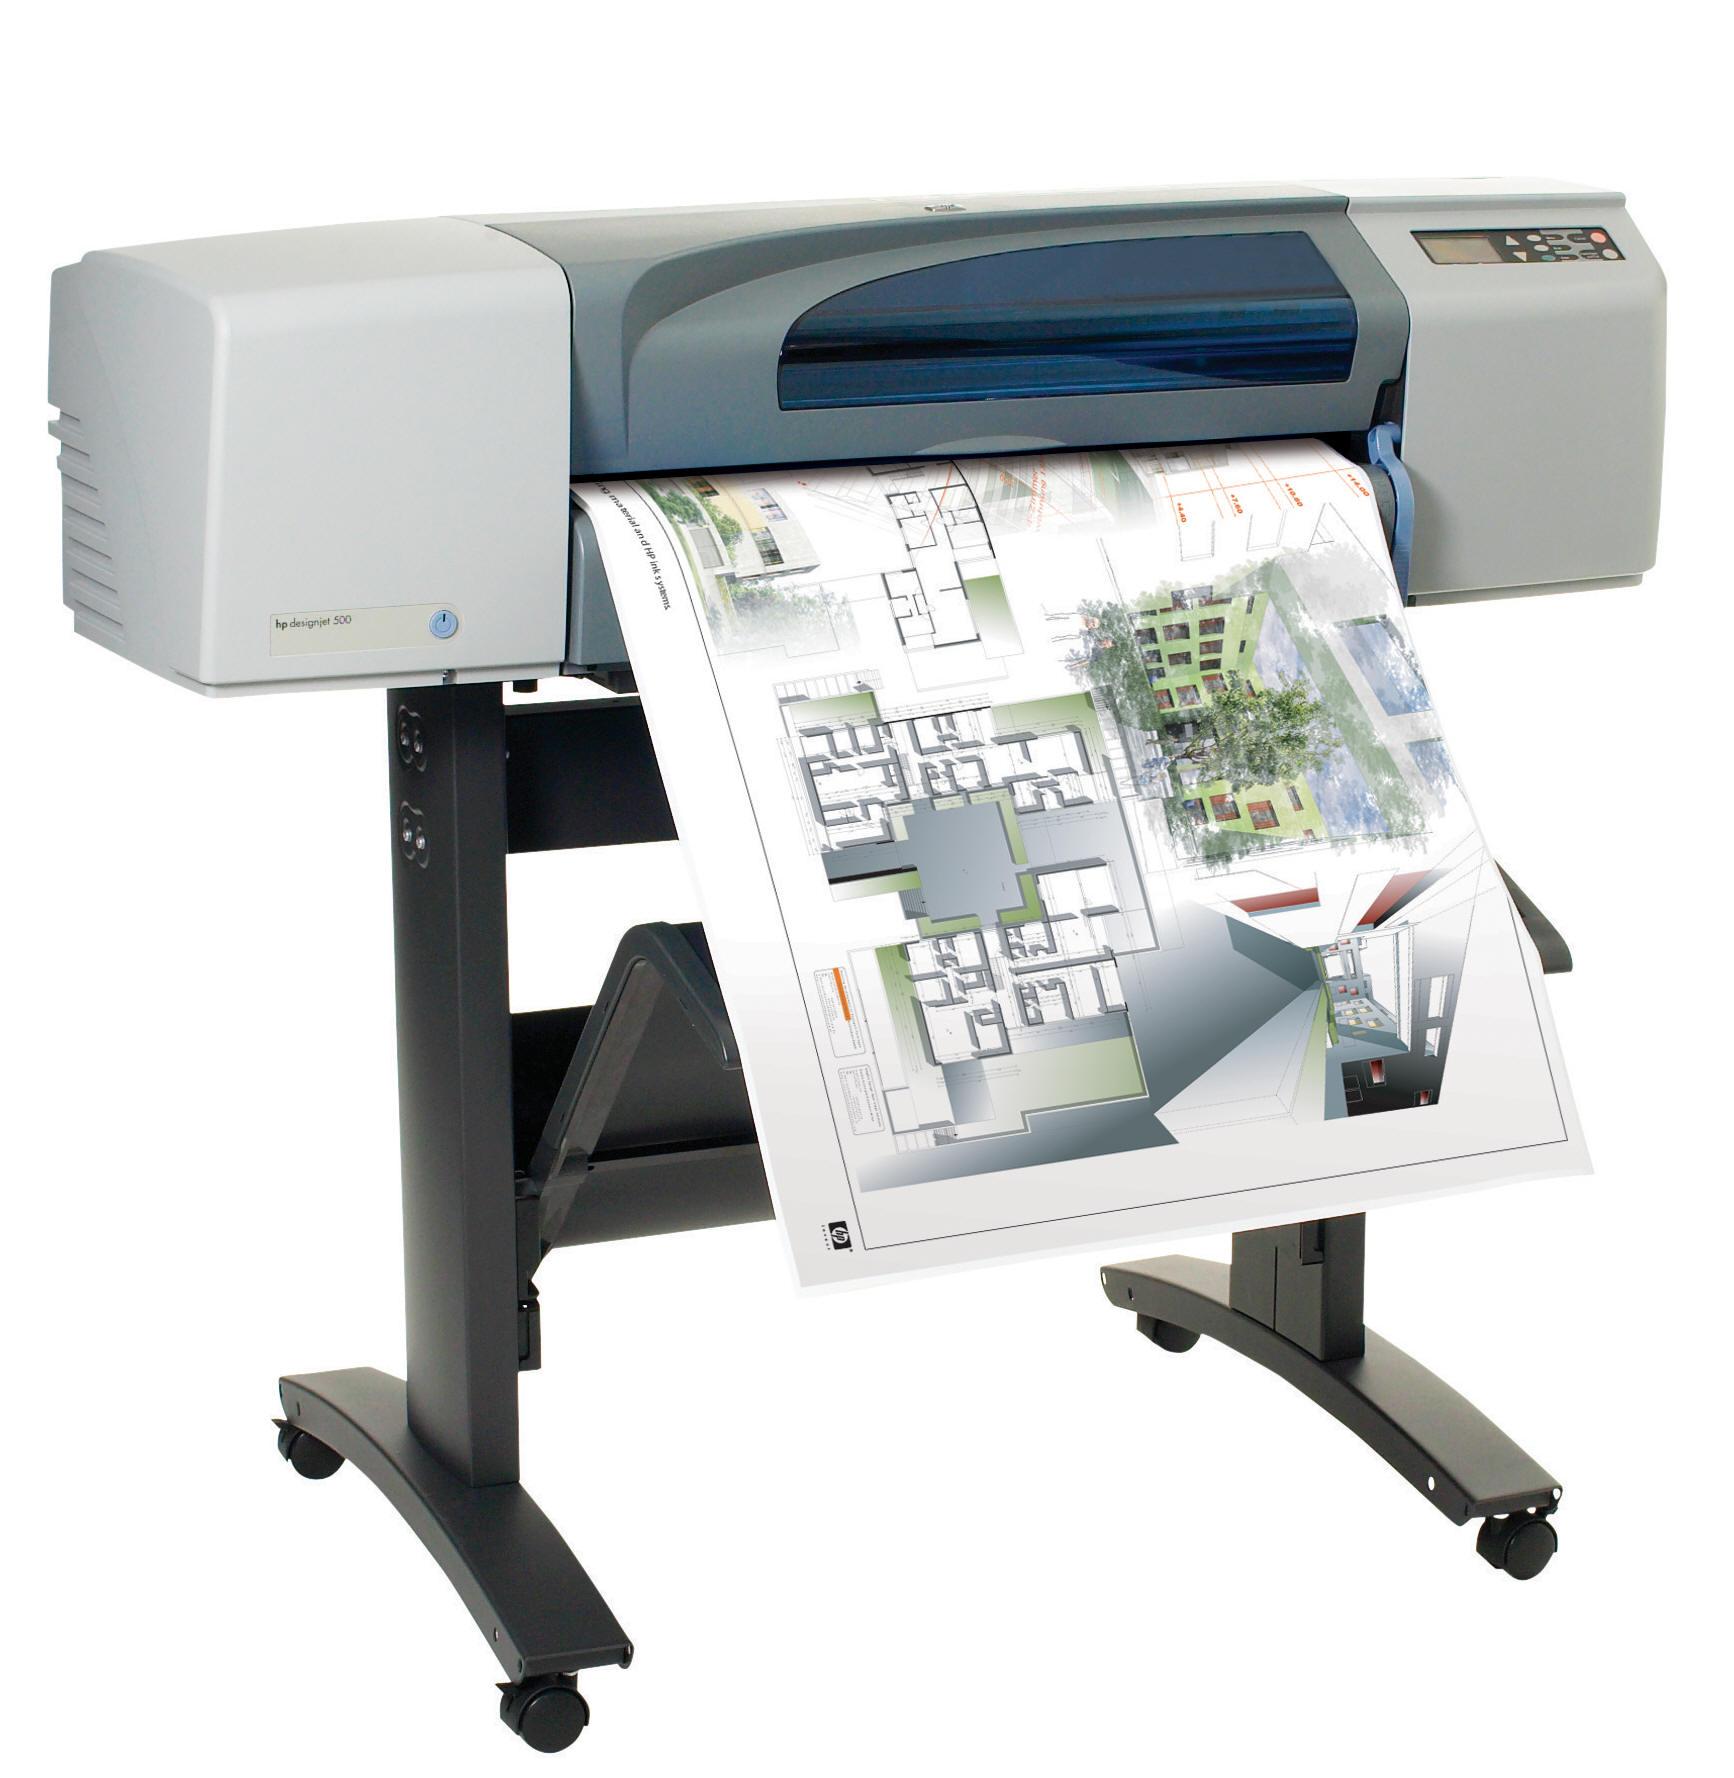 vendita noleggio stampa grande plotter hp designjet 500